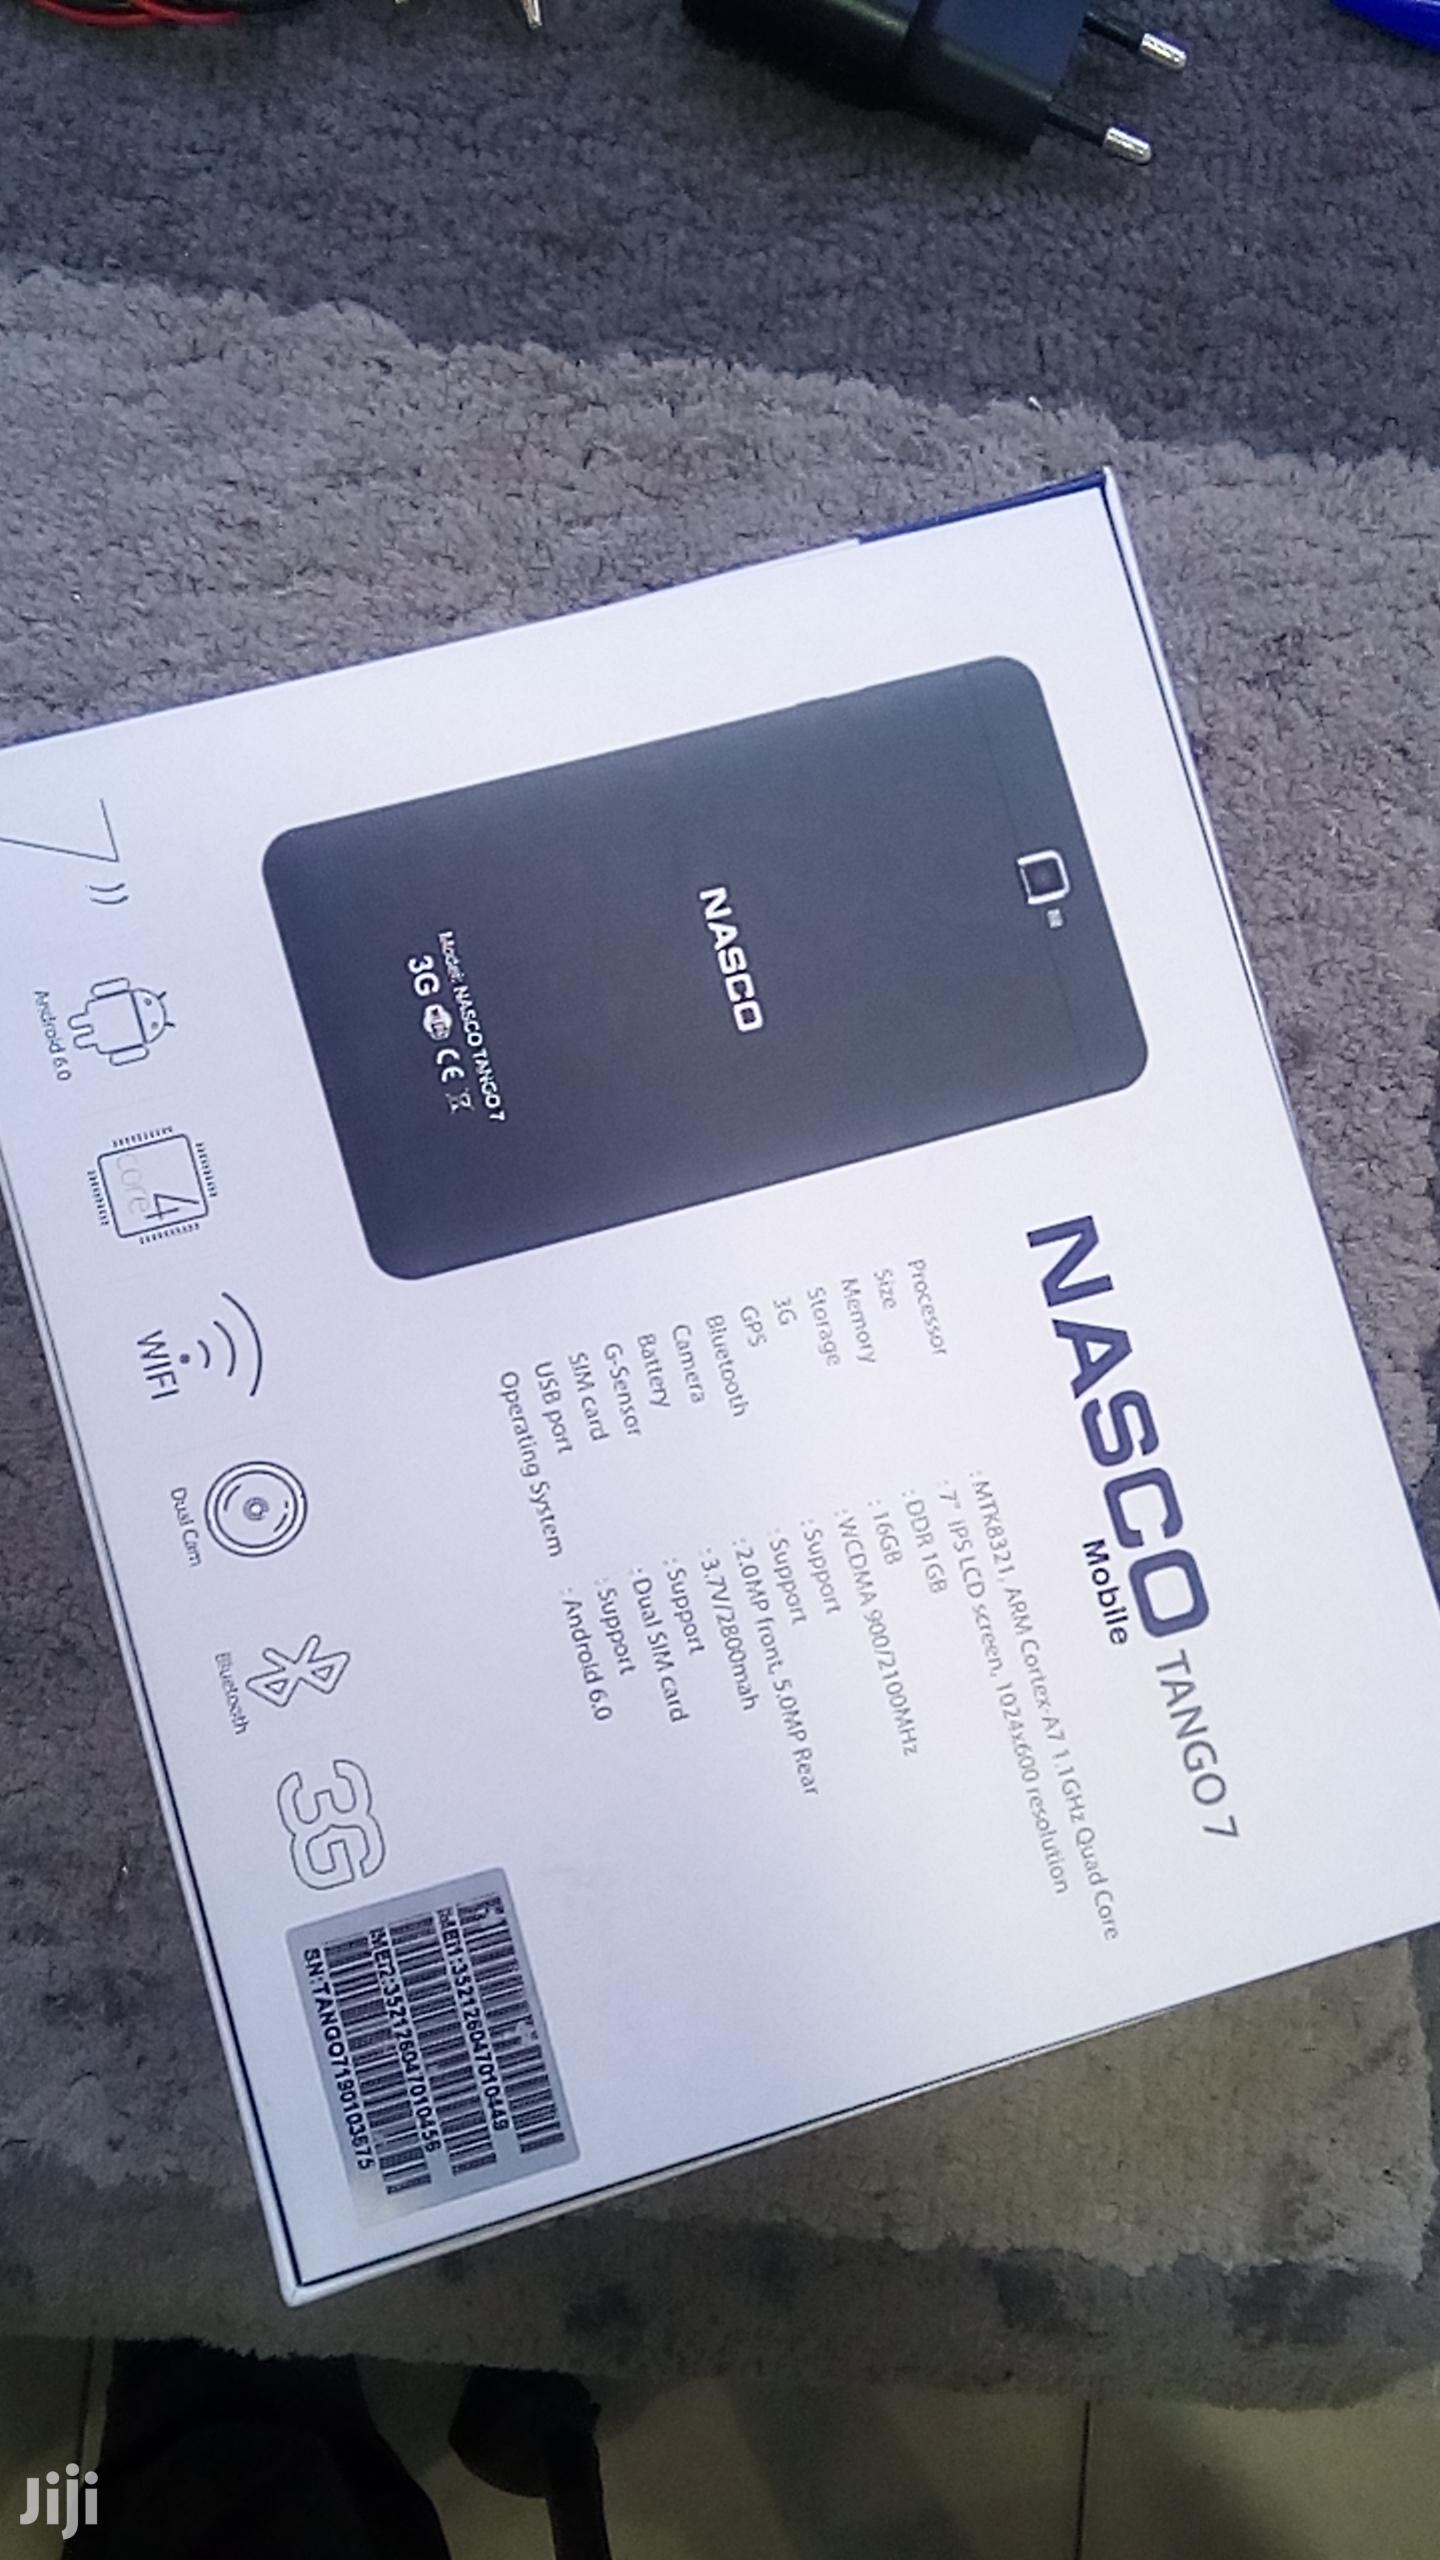 New Nasco Tango 7 16 GB Black | Tablets for sale in Kokomlemle, Greater Accra, Ghana